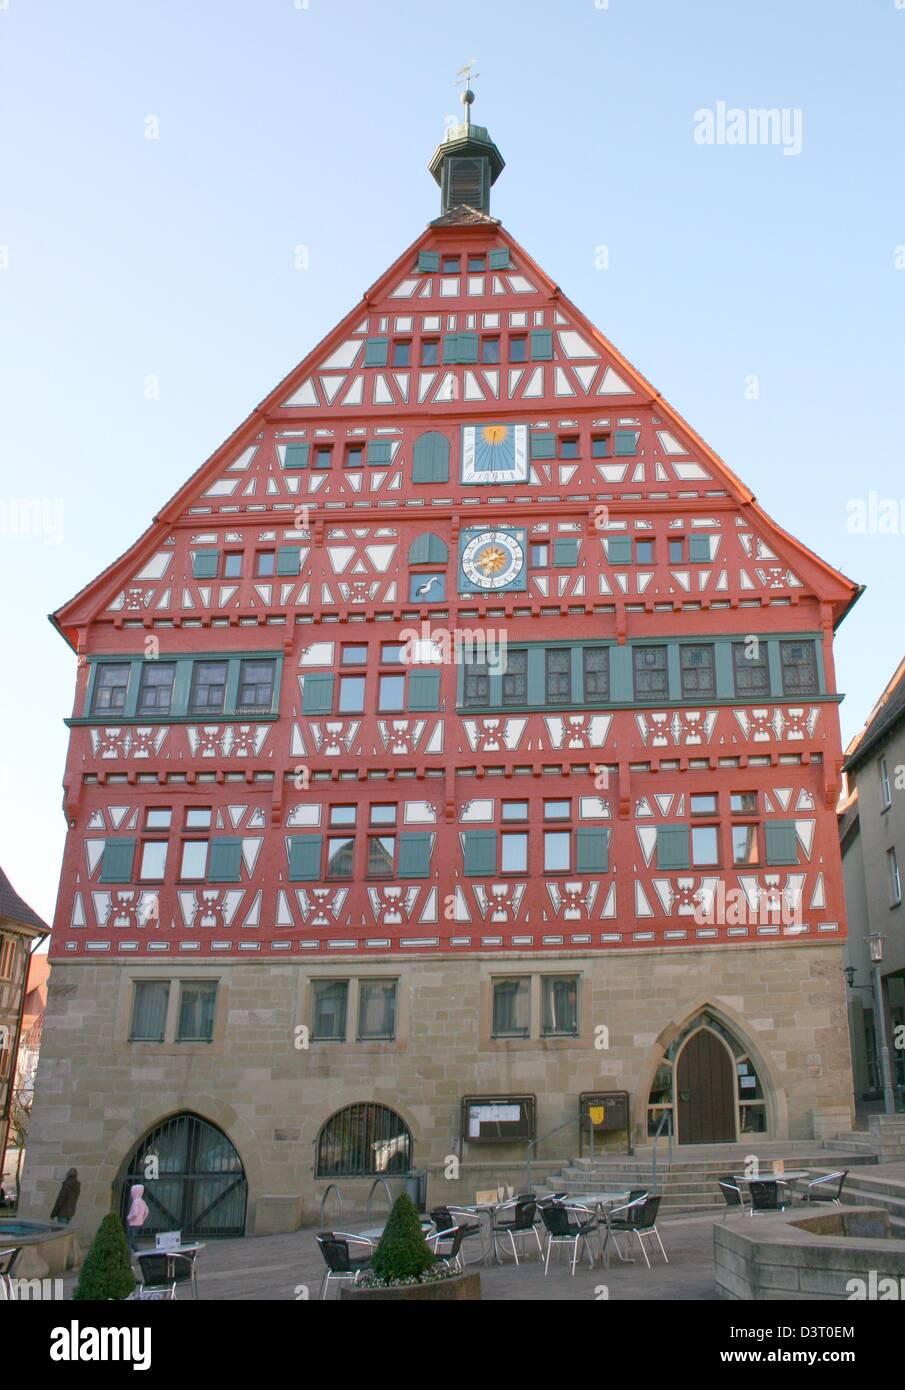 historic City Hall - Stock Image